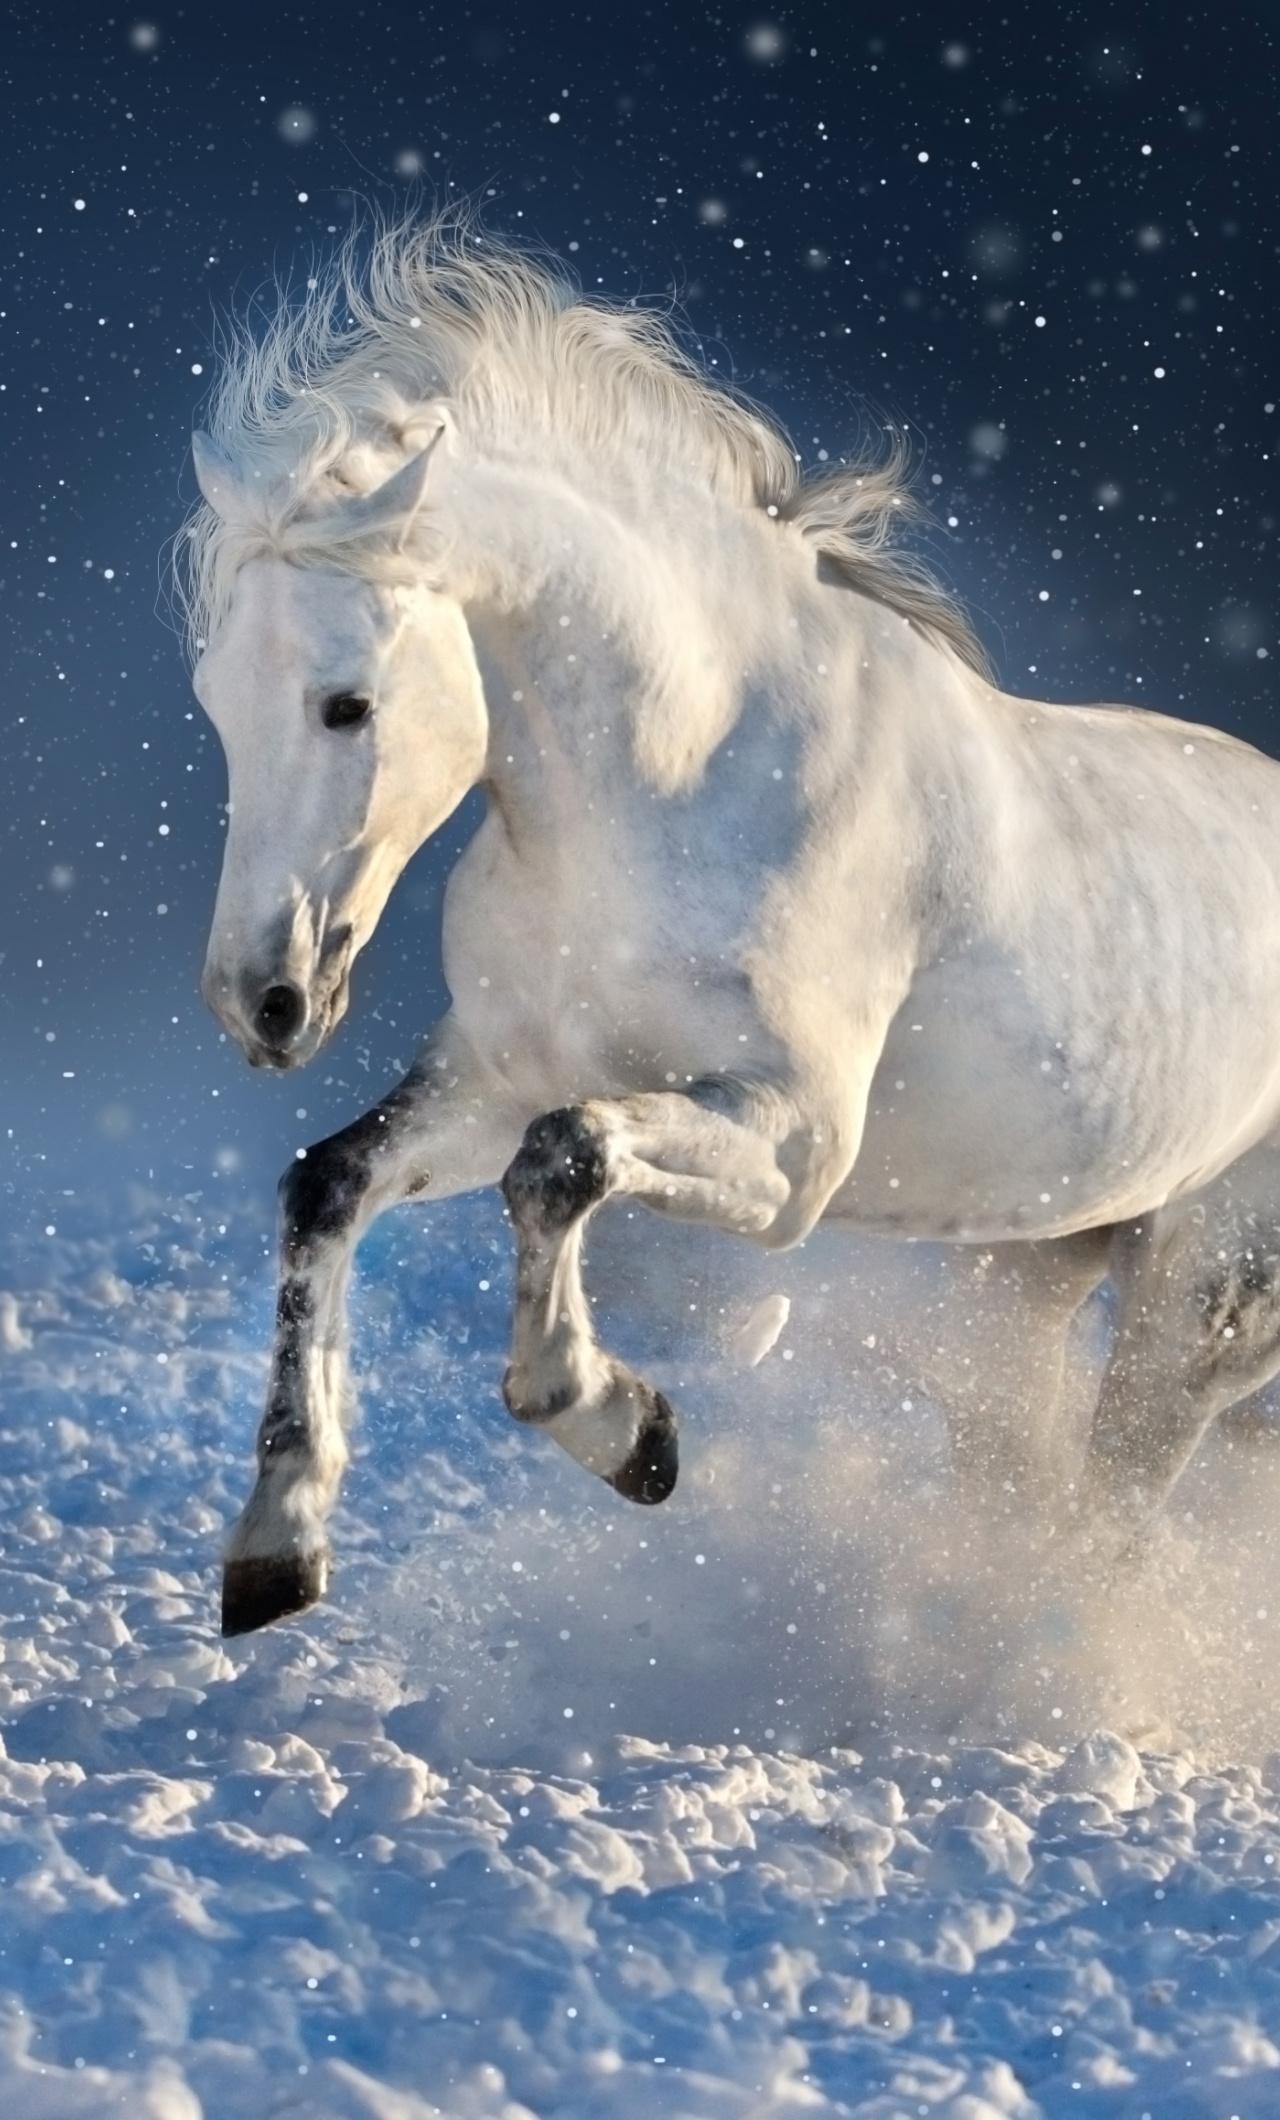 White Horse Run Mammal Portrait Wallpaper Iphone 7 Horse Wallpaper Iphone 1280x2120 Wallpaper Teahub Io